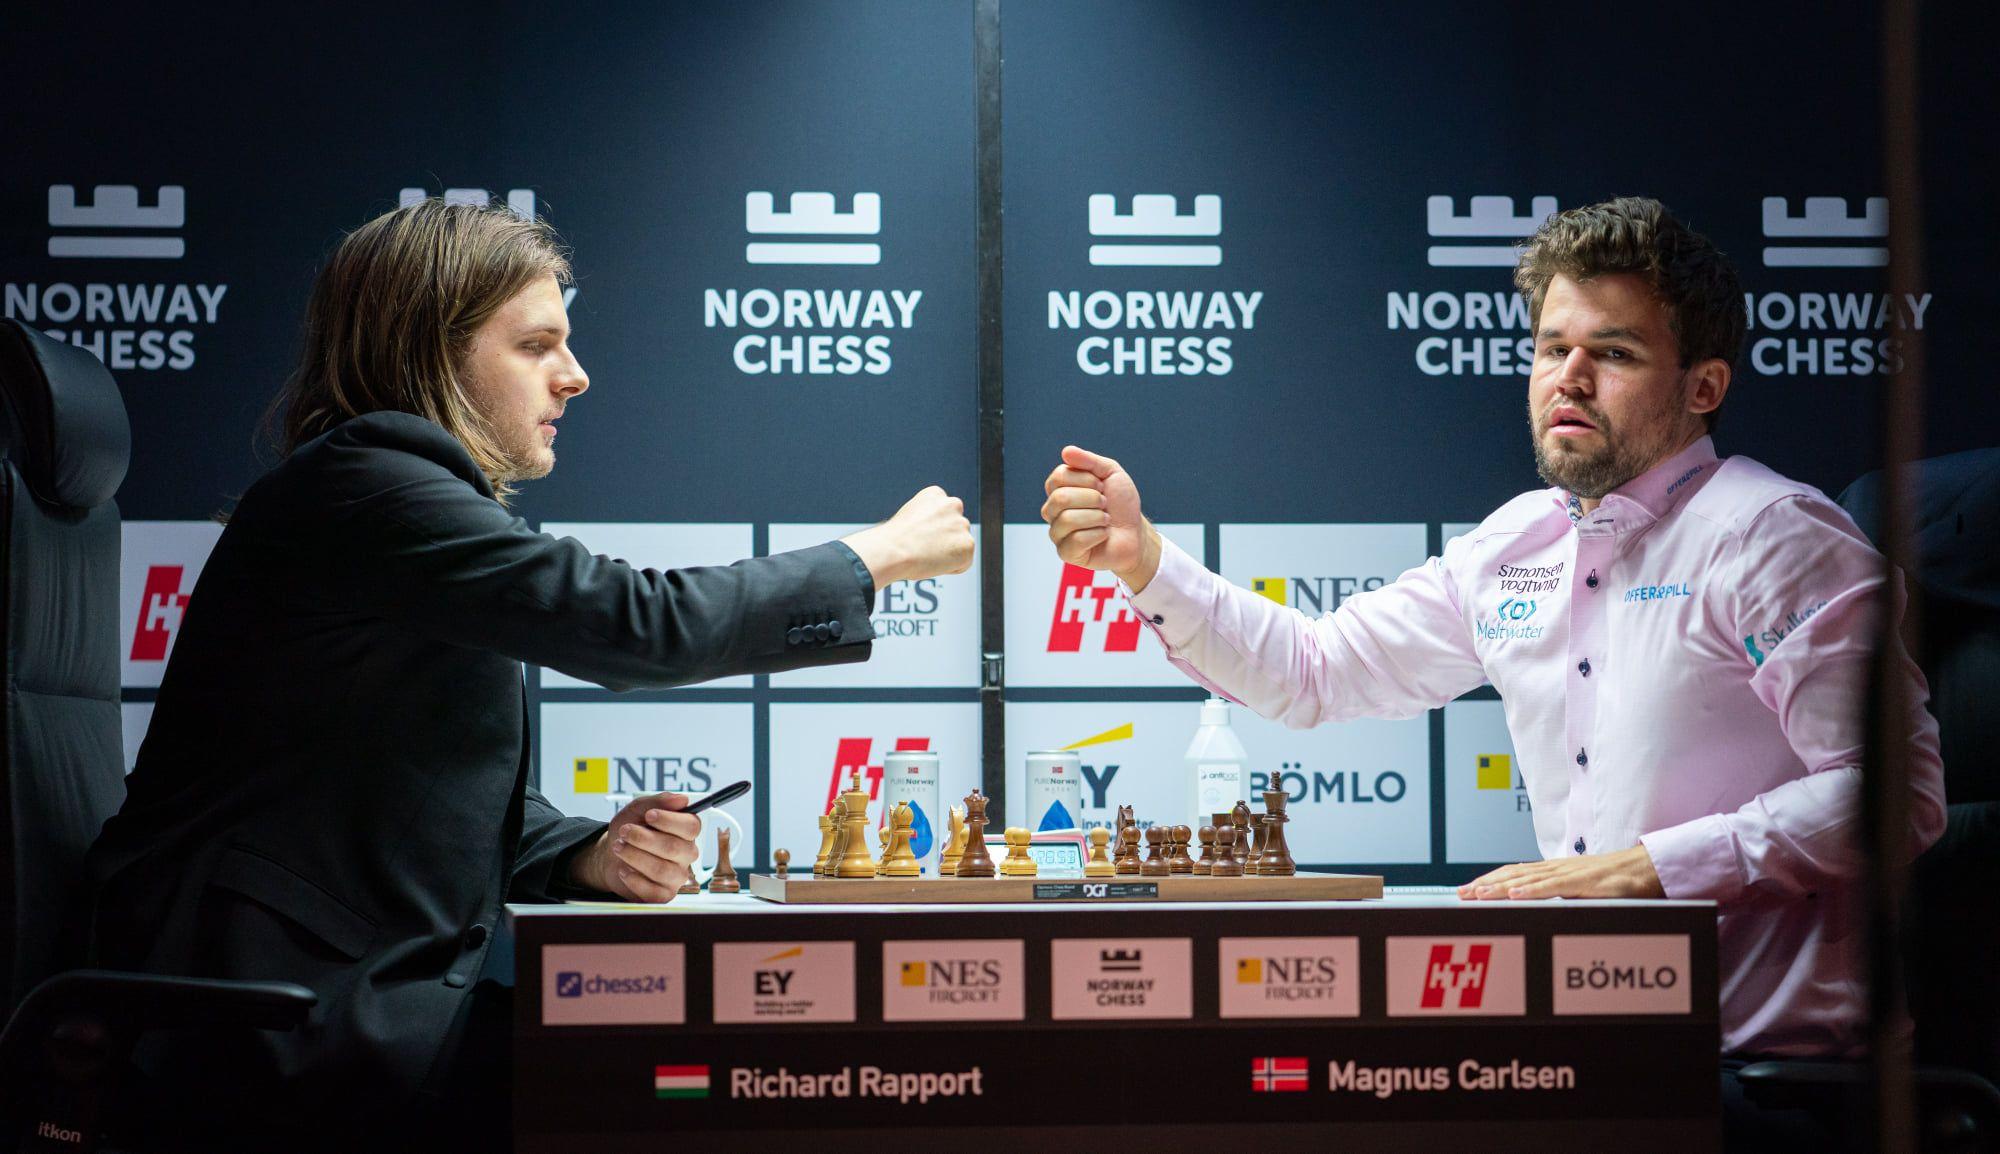 Rapport Carlsen sorteio de xadrez da Noruega em 2021